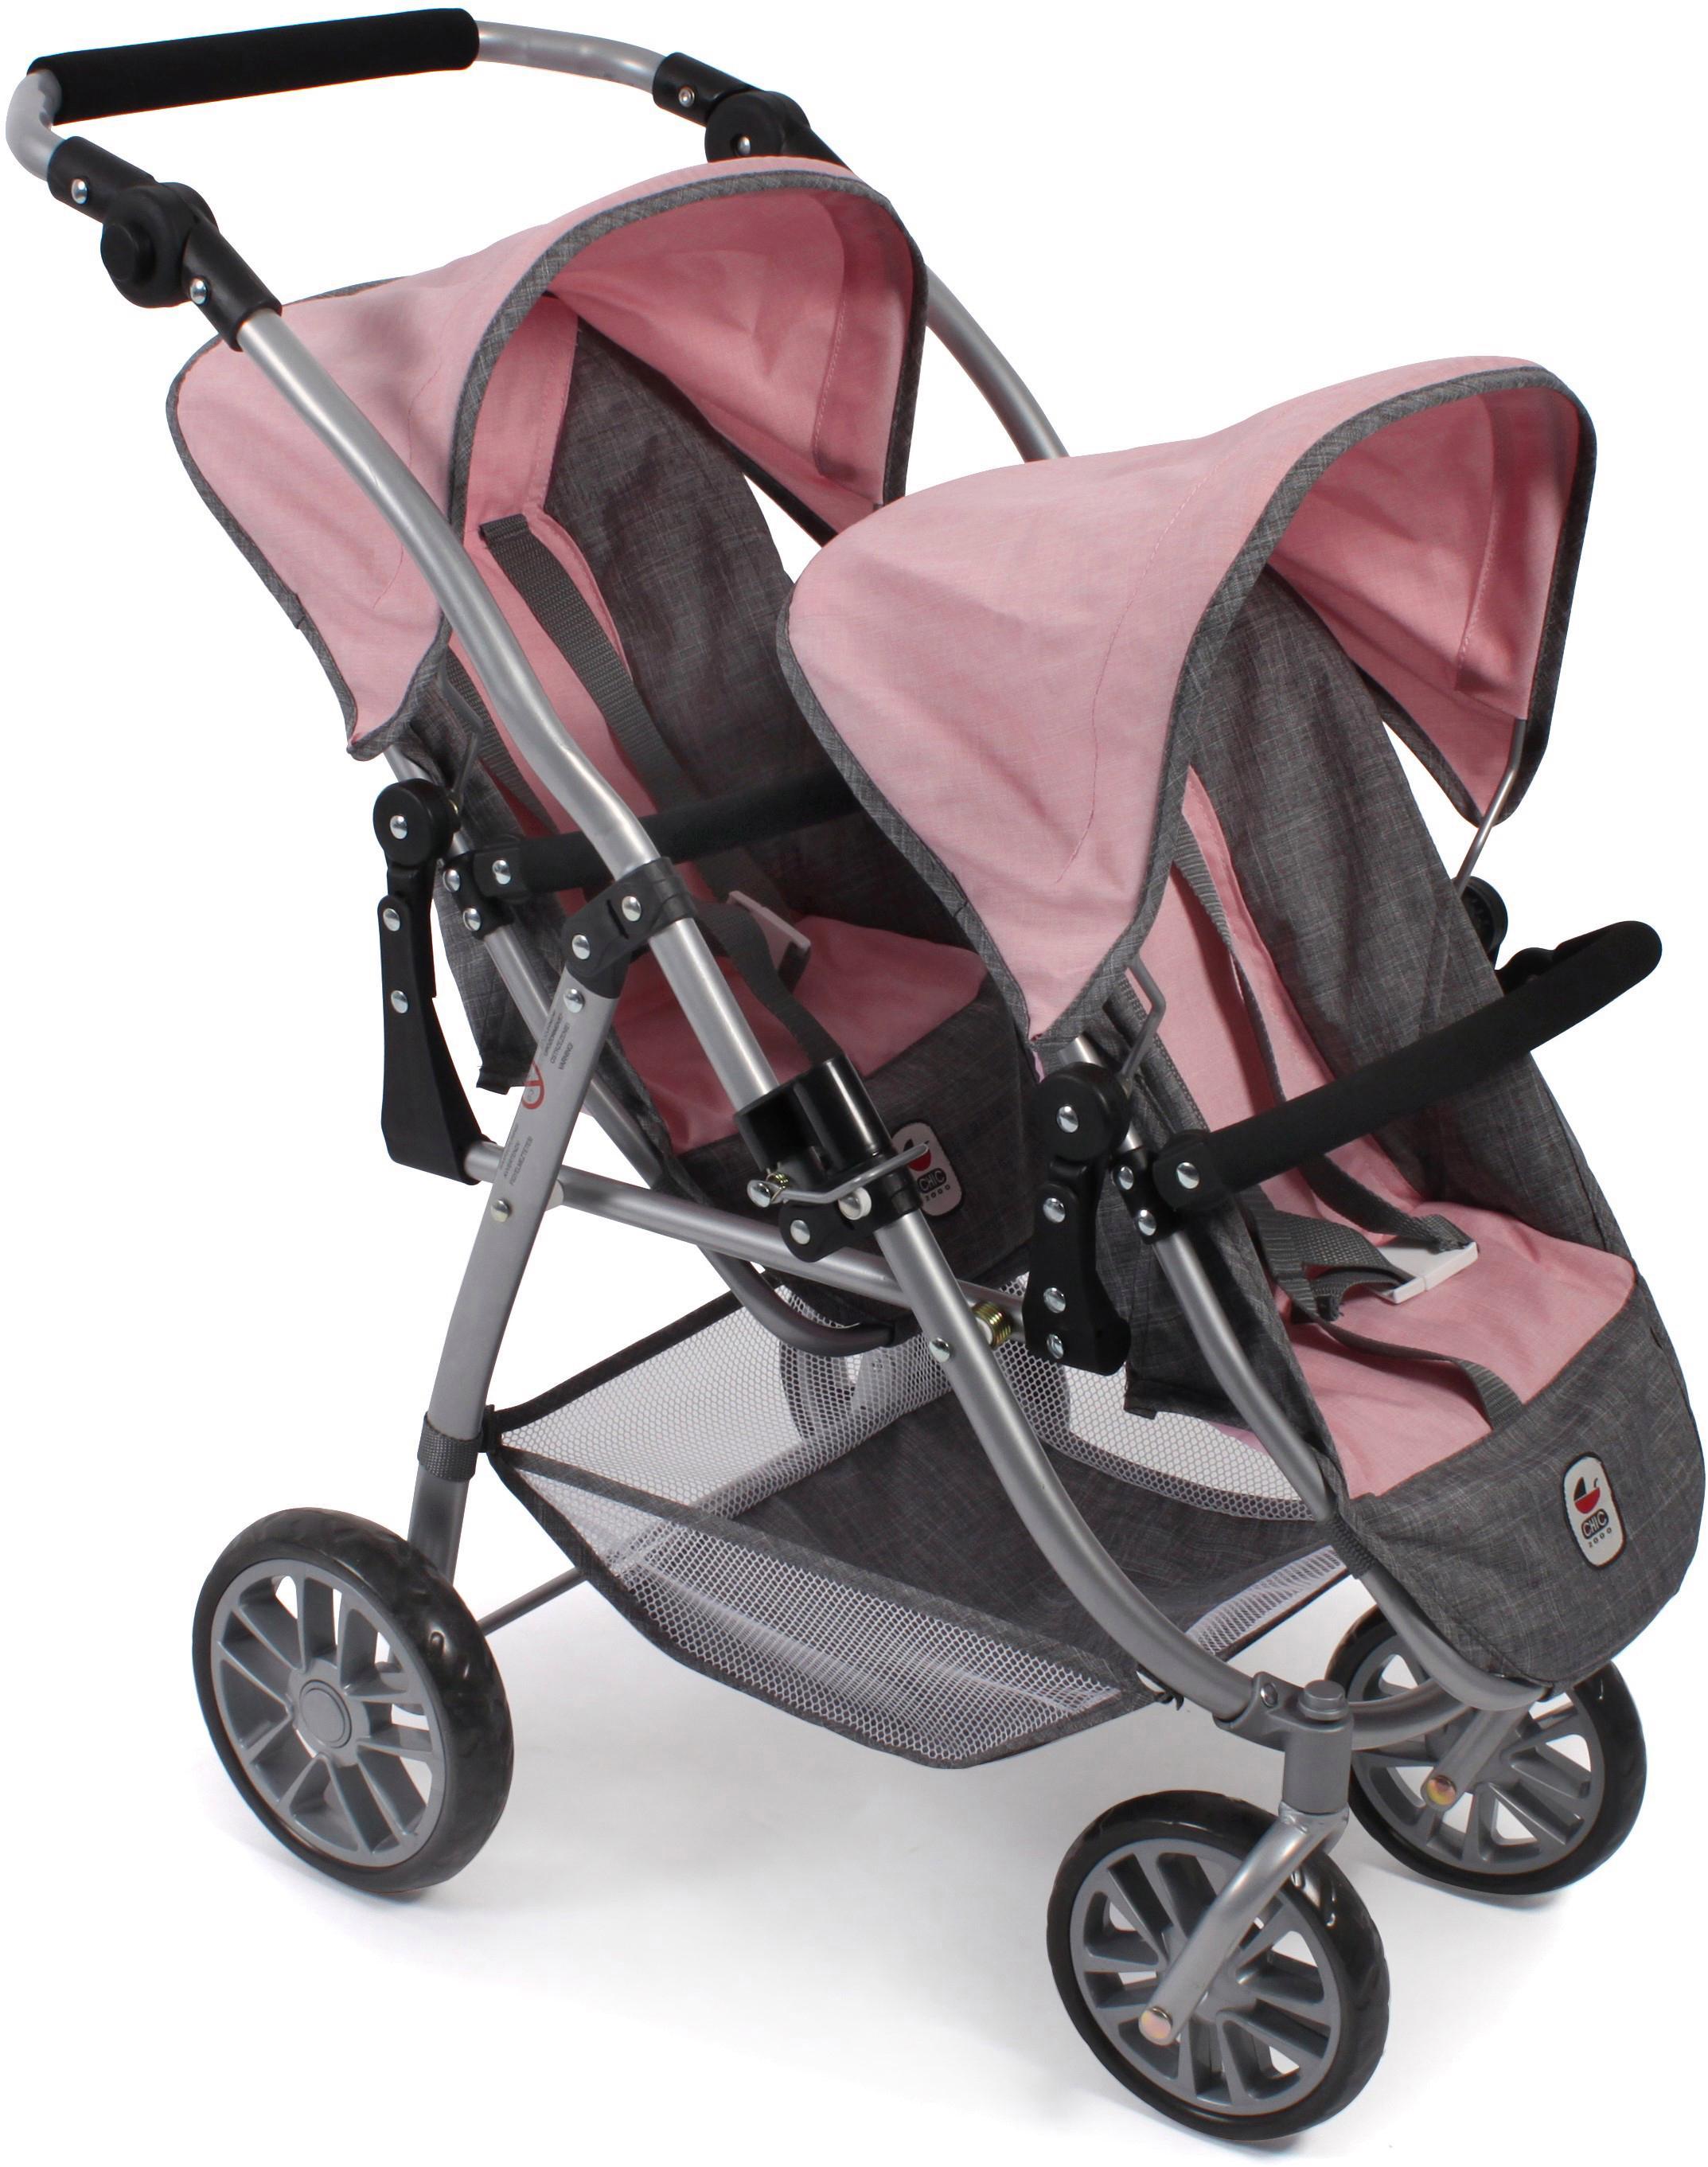 CHIC2000 Puppen-Zwillingsbuggy Tandem-Puppen-Buggy Vario, grau-rosa rosa Kinder Puppenwagen -trage Puppen